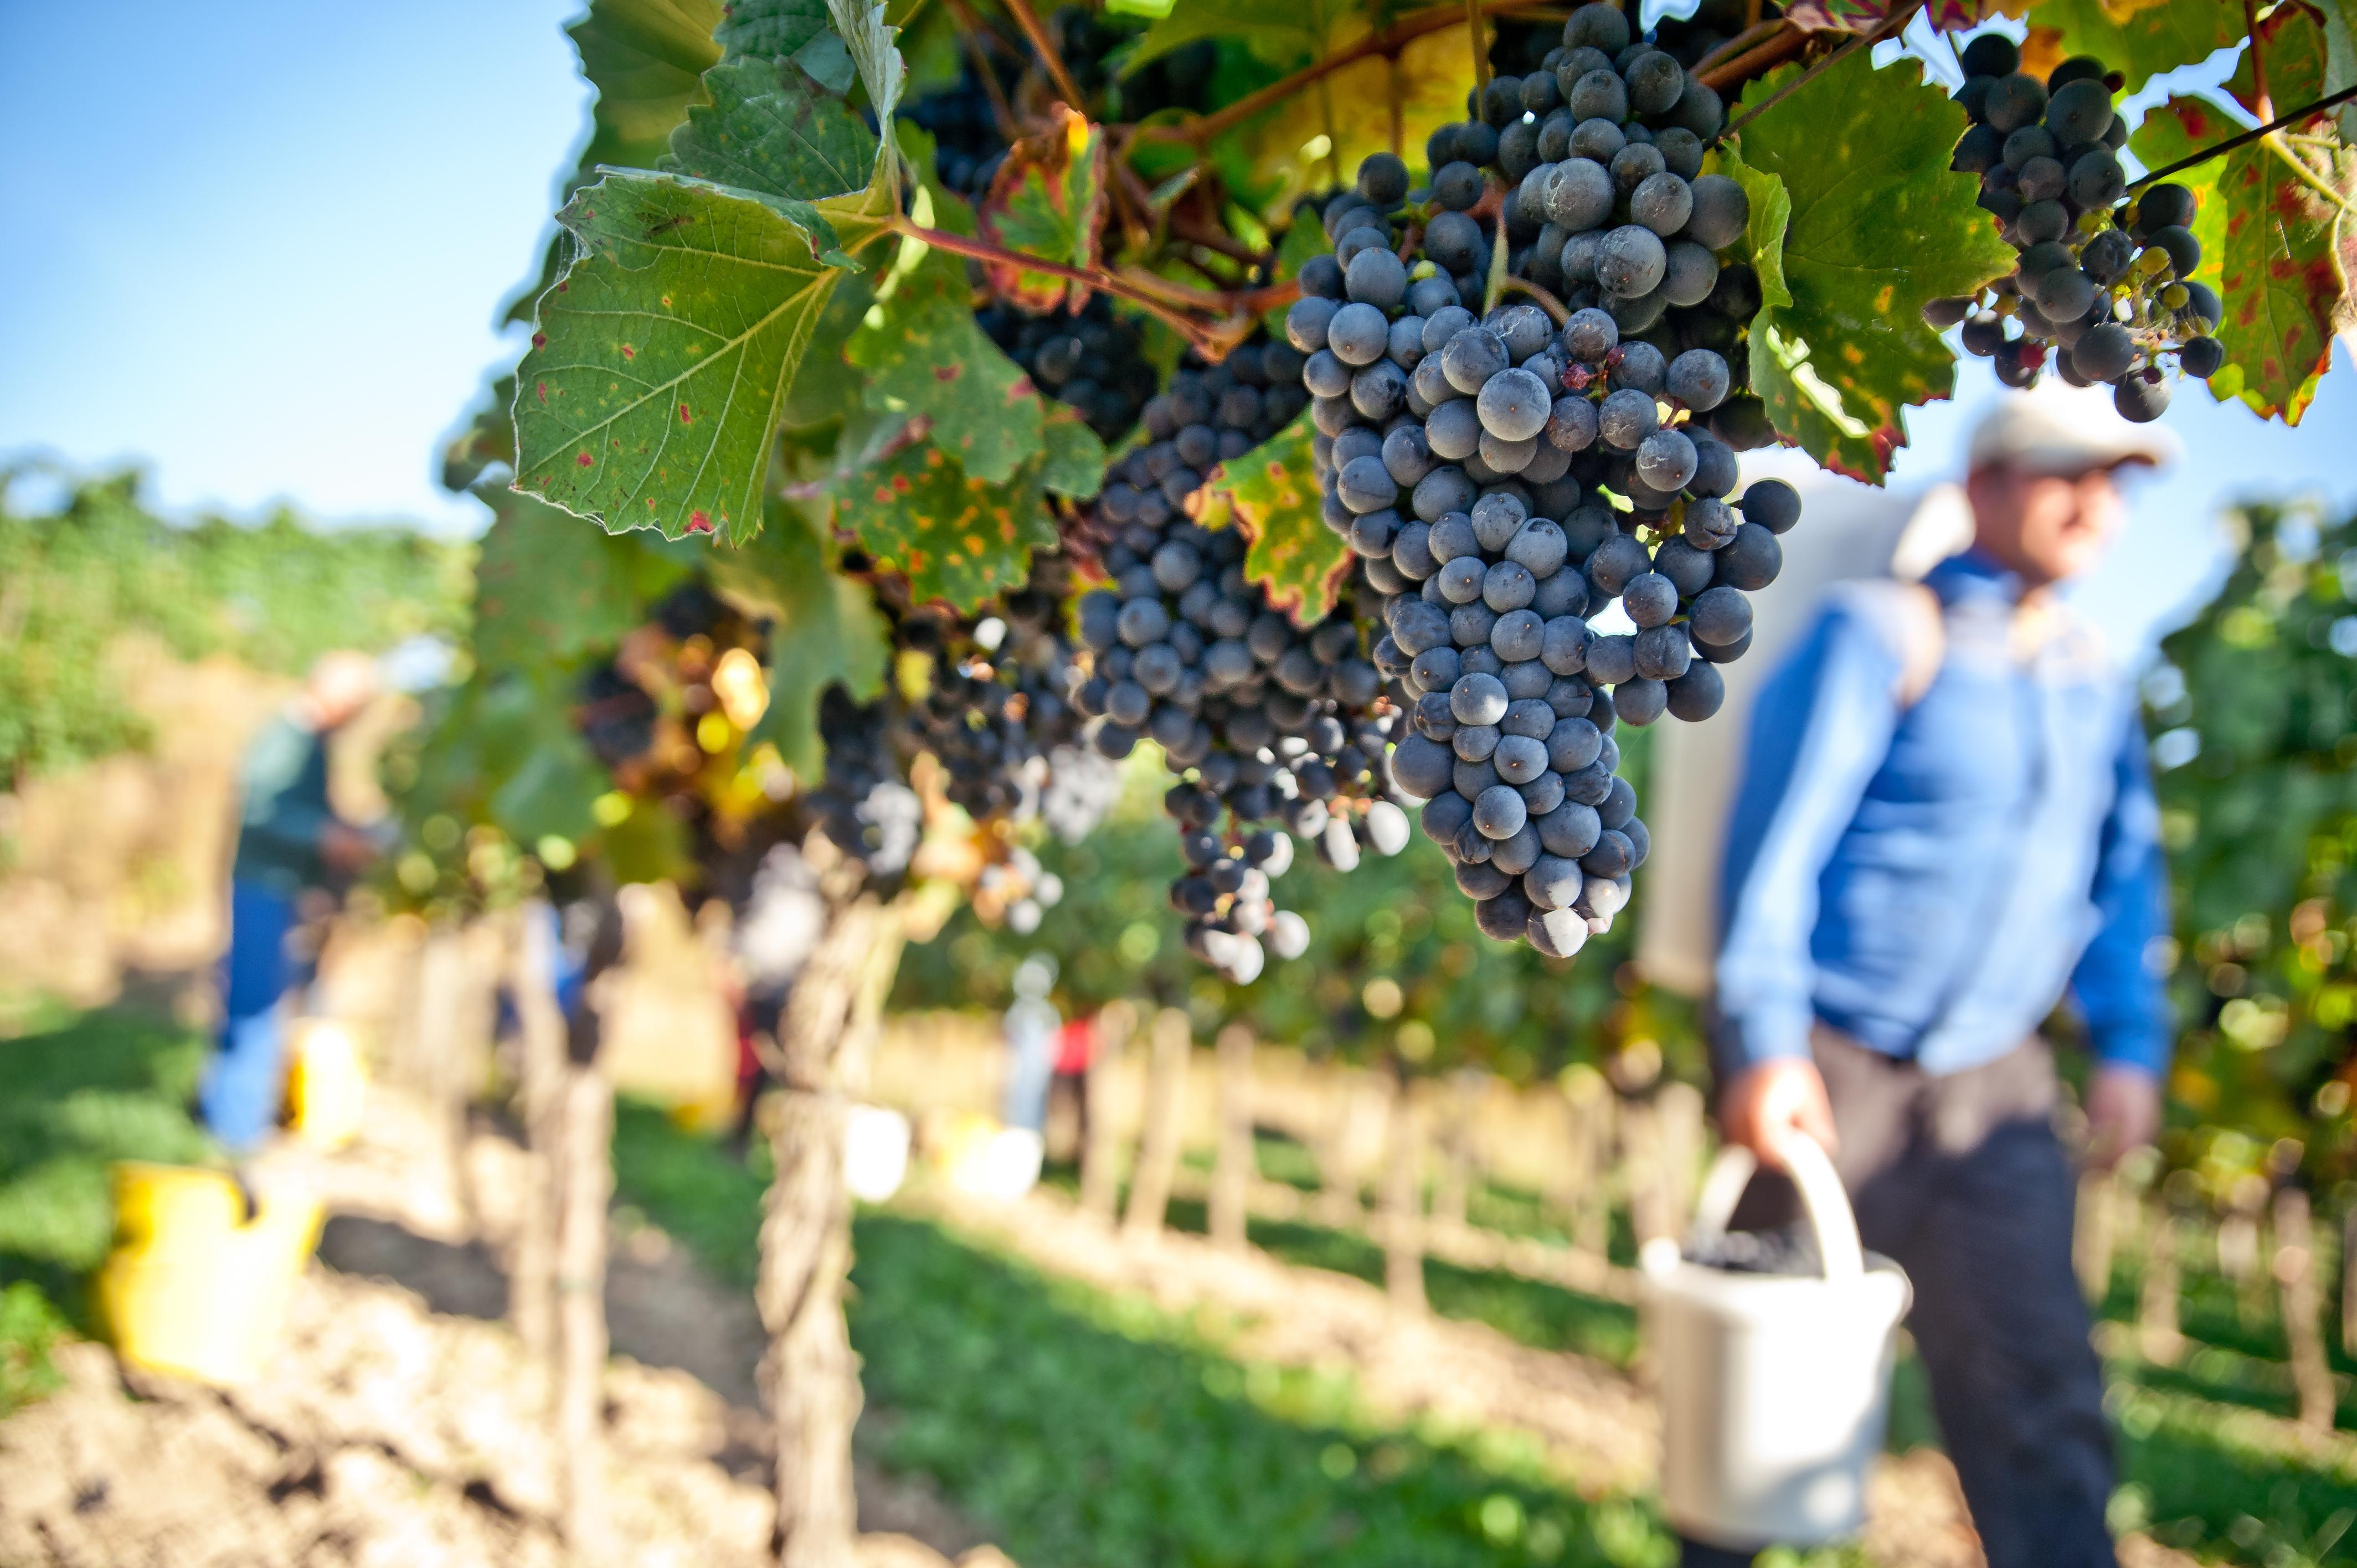 Horticulture & Viticulture